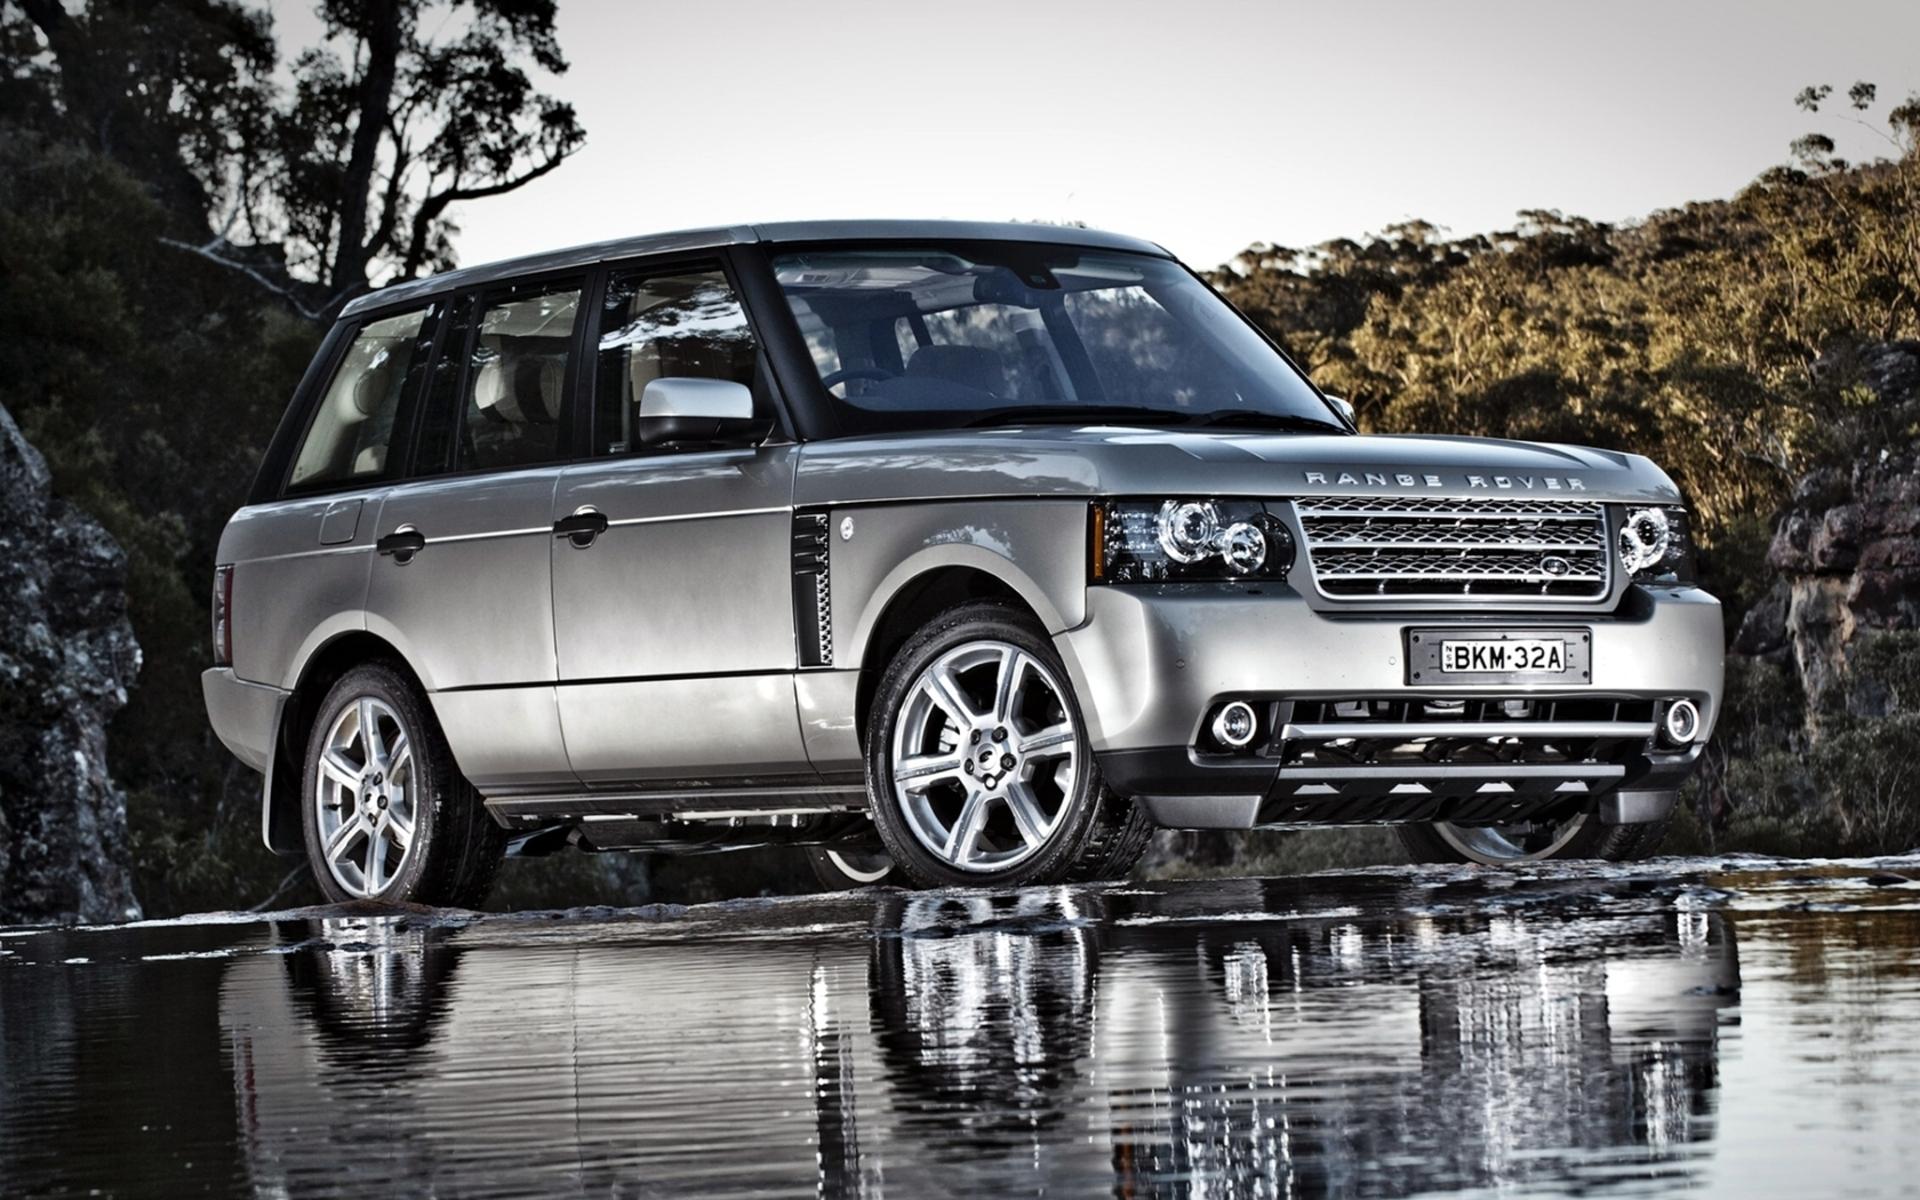 Range Rover HD Wallpaper